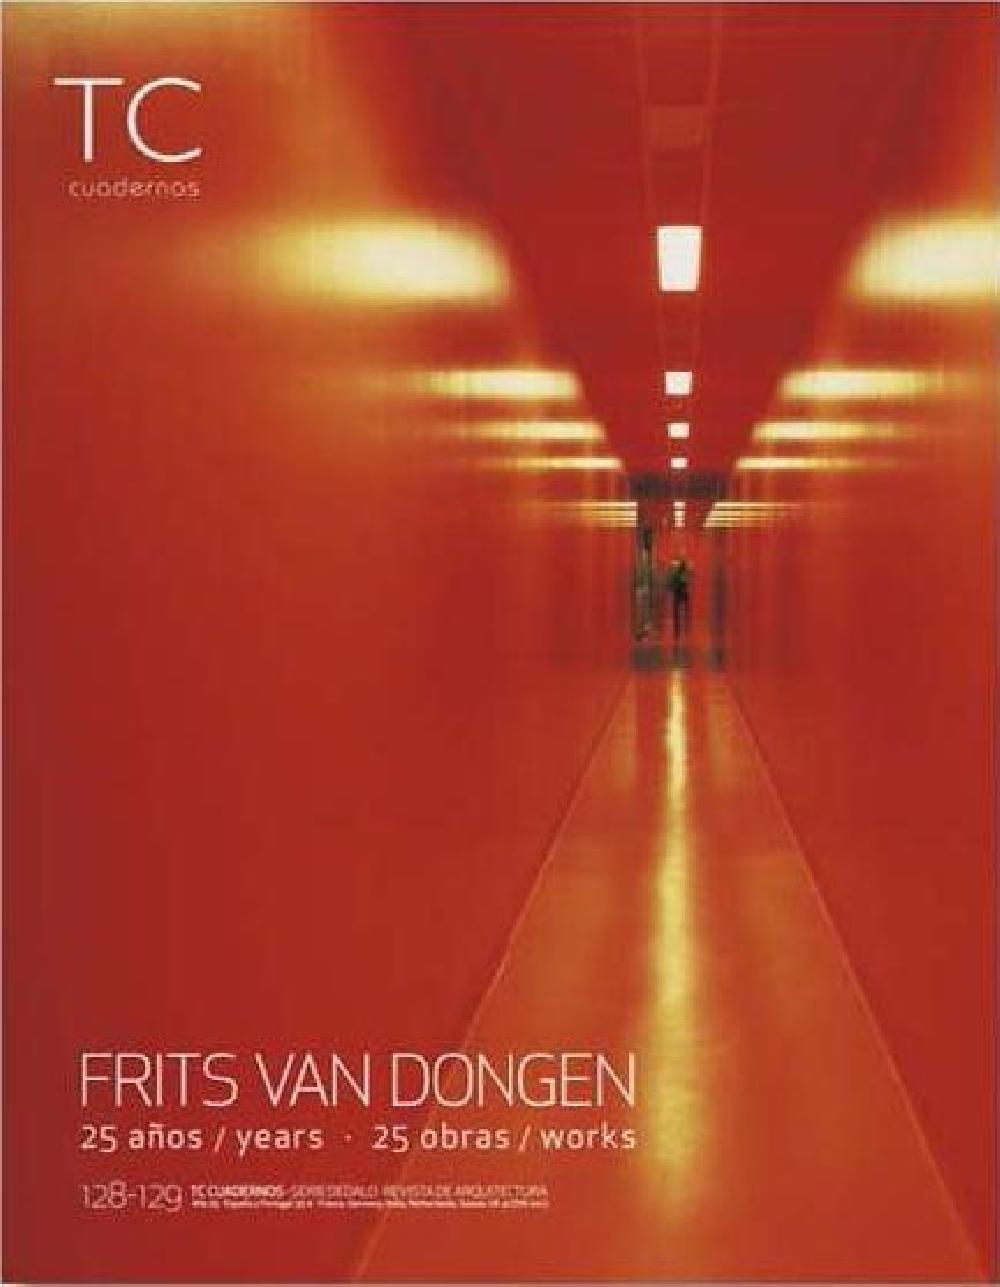 TC Cuadernos 128/129 - FRITS VAN DONGEN 25 years/anos 25 works/obras